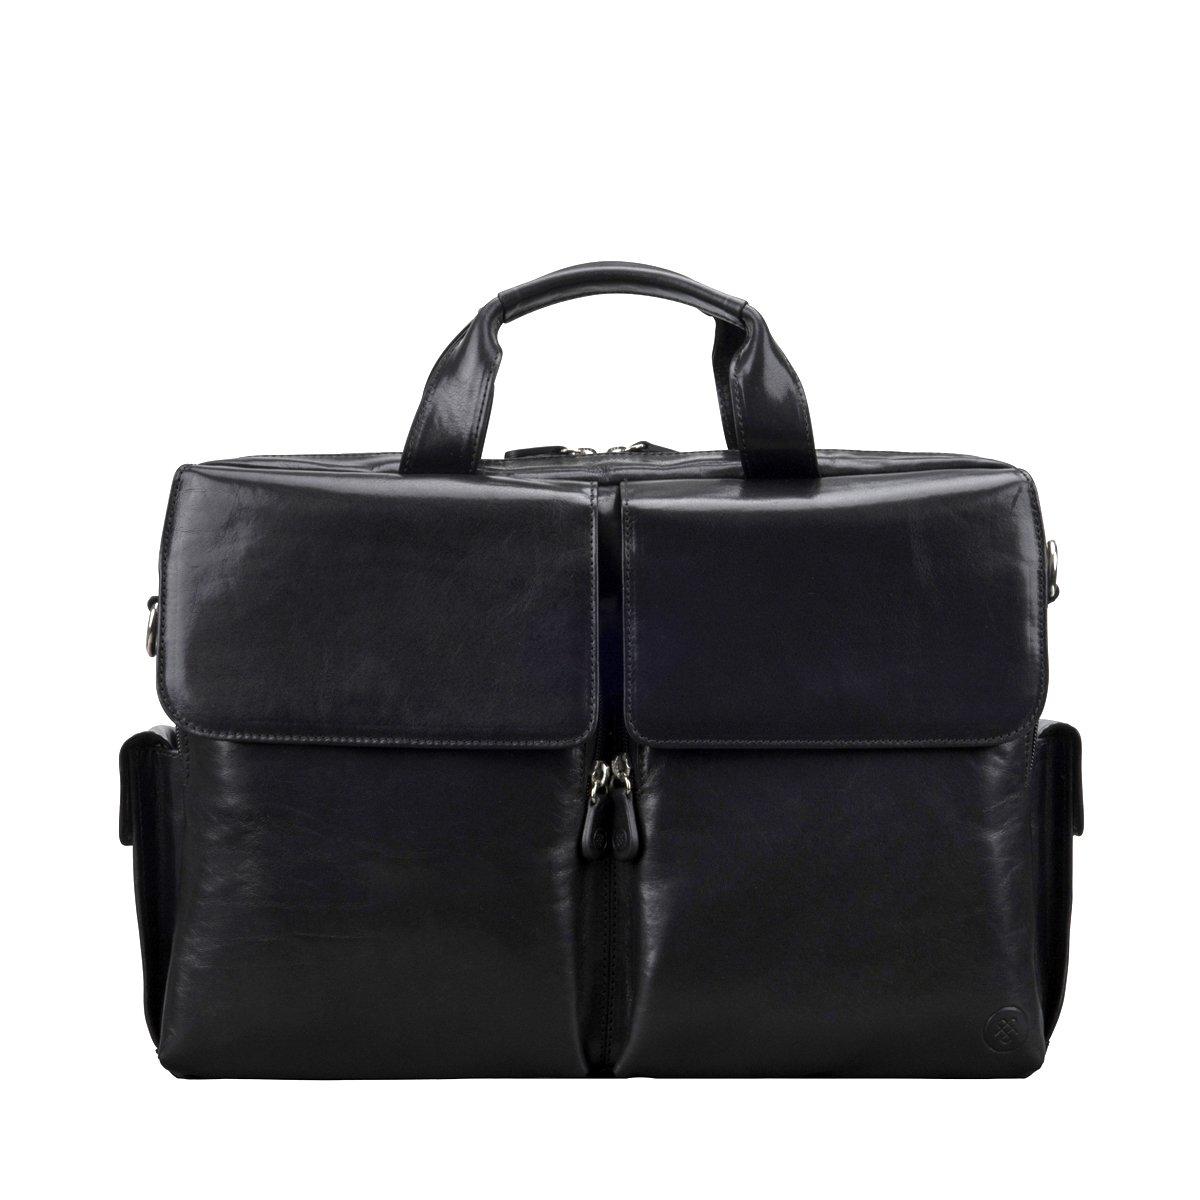 Maxwell Scott Men's Real Italian Leather Briefcase - Lagaro Black